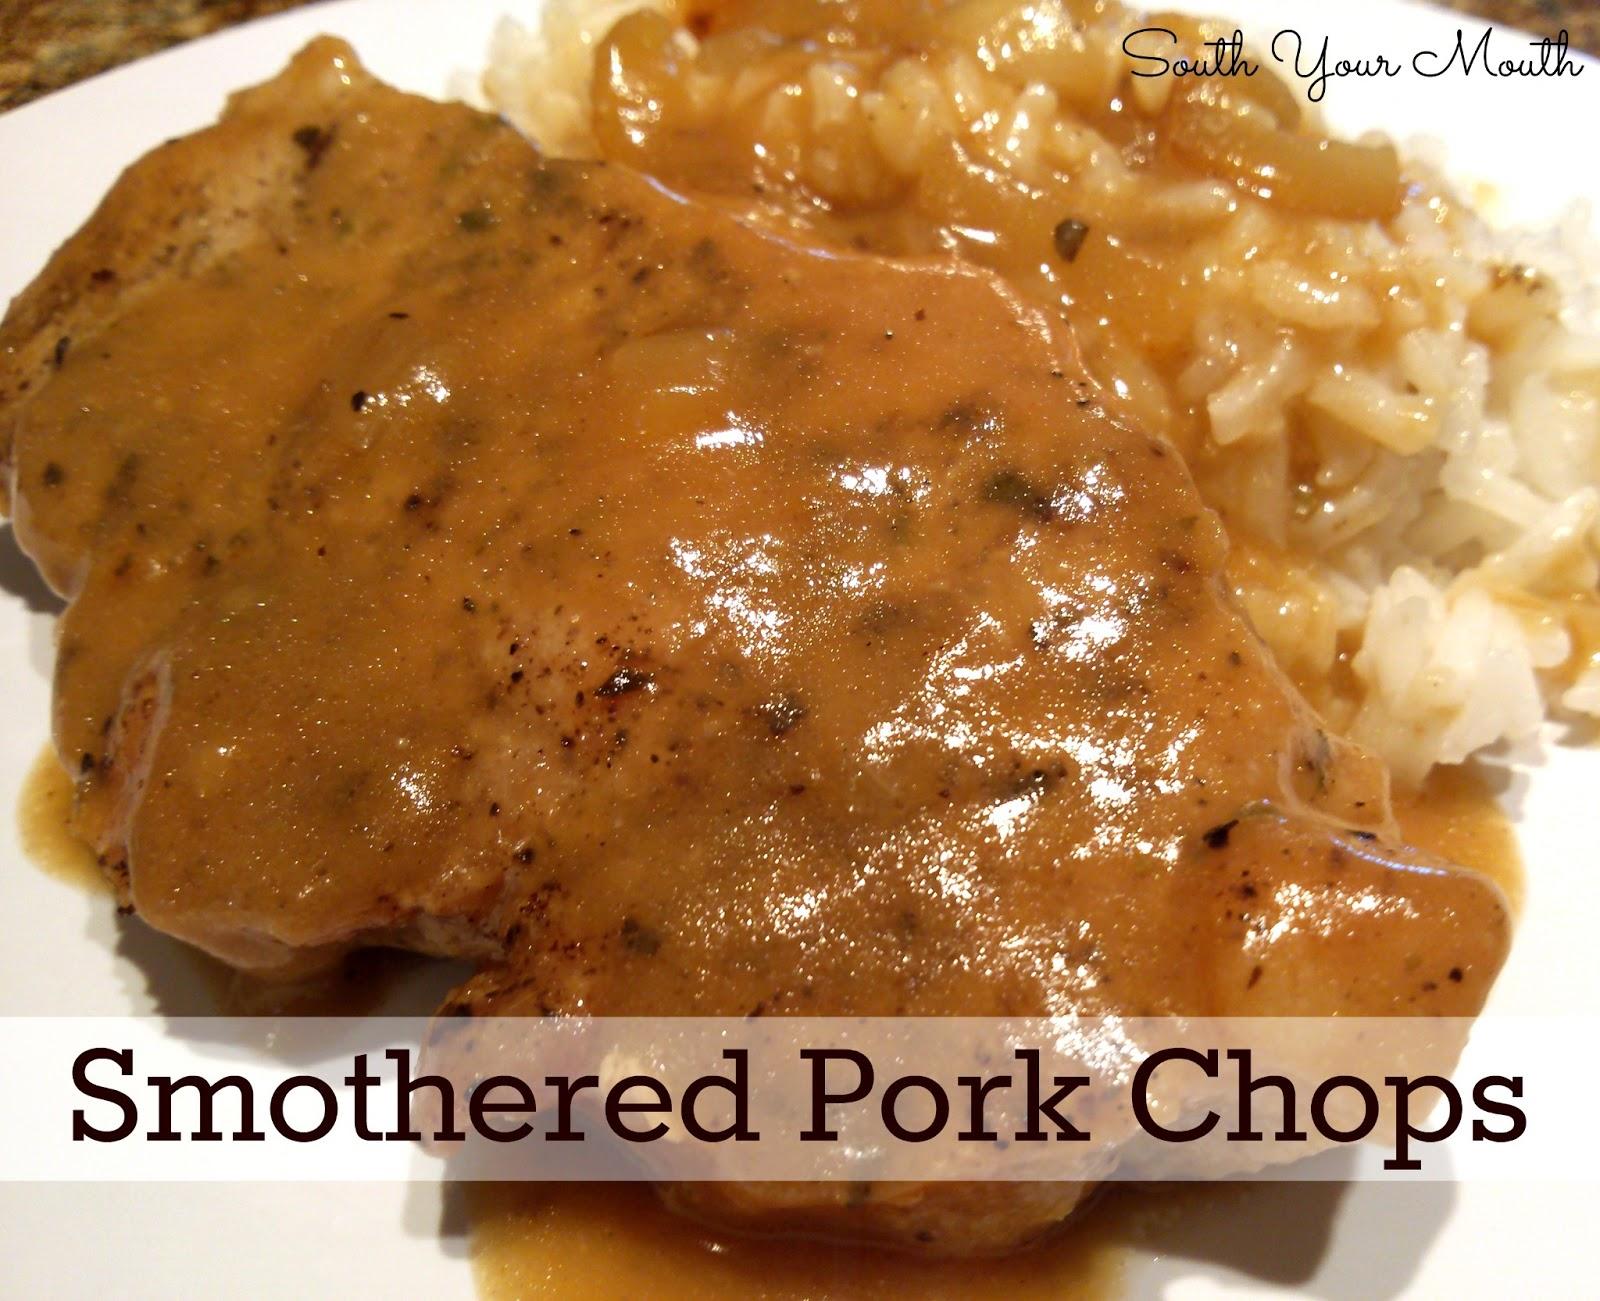 Fried pork chop recipe without flour